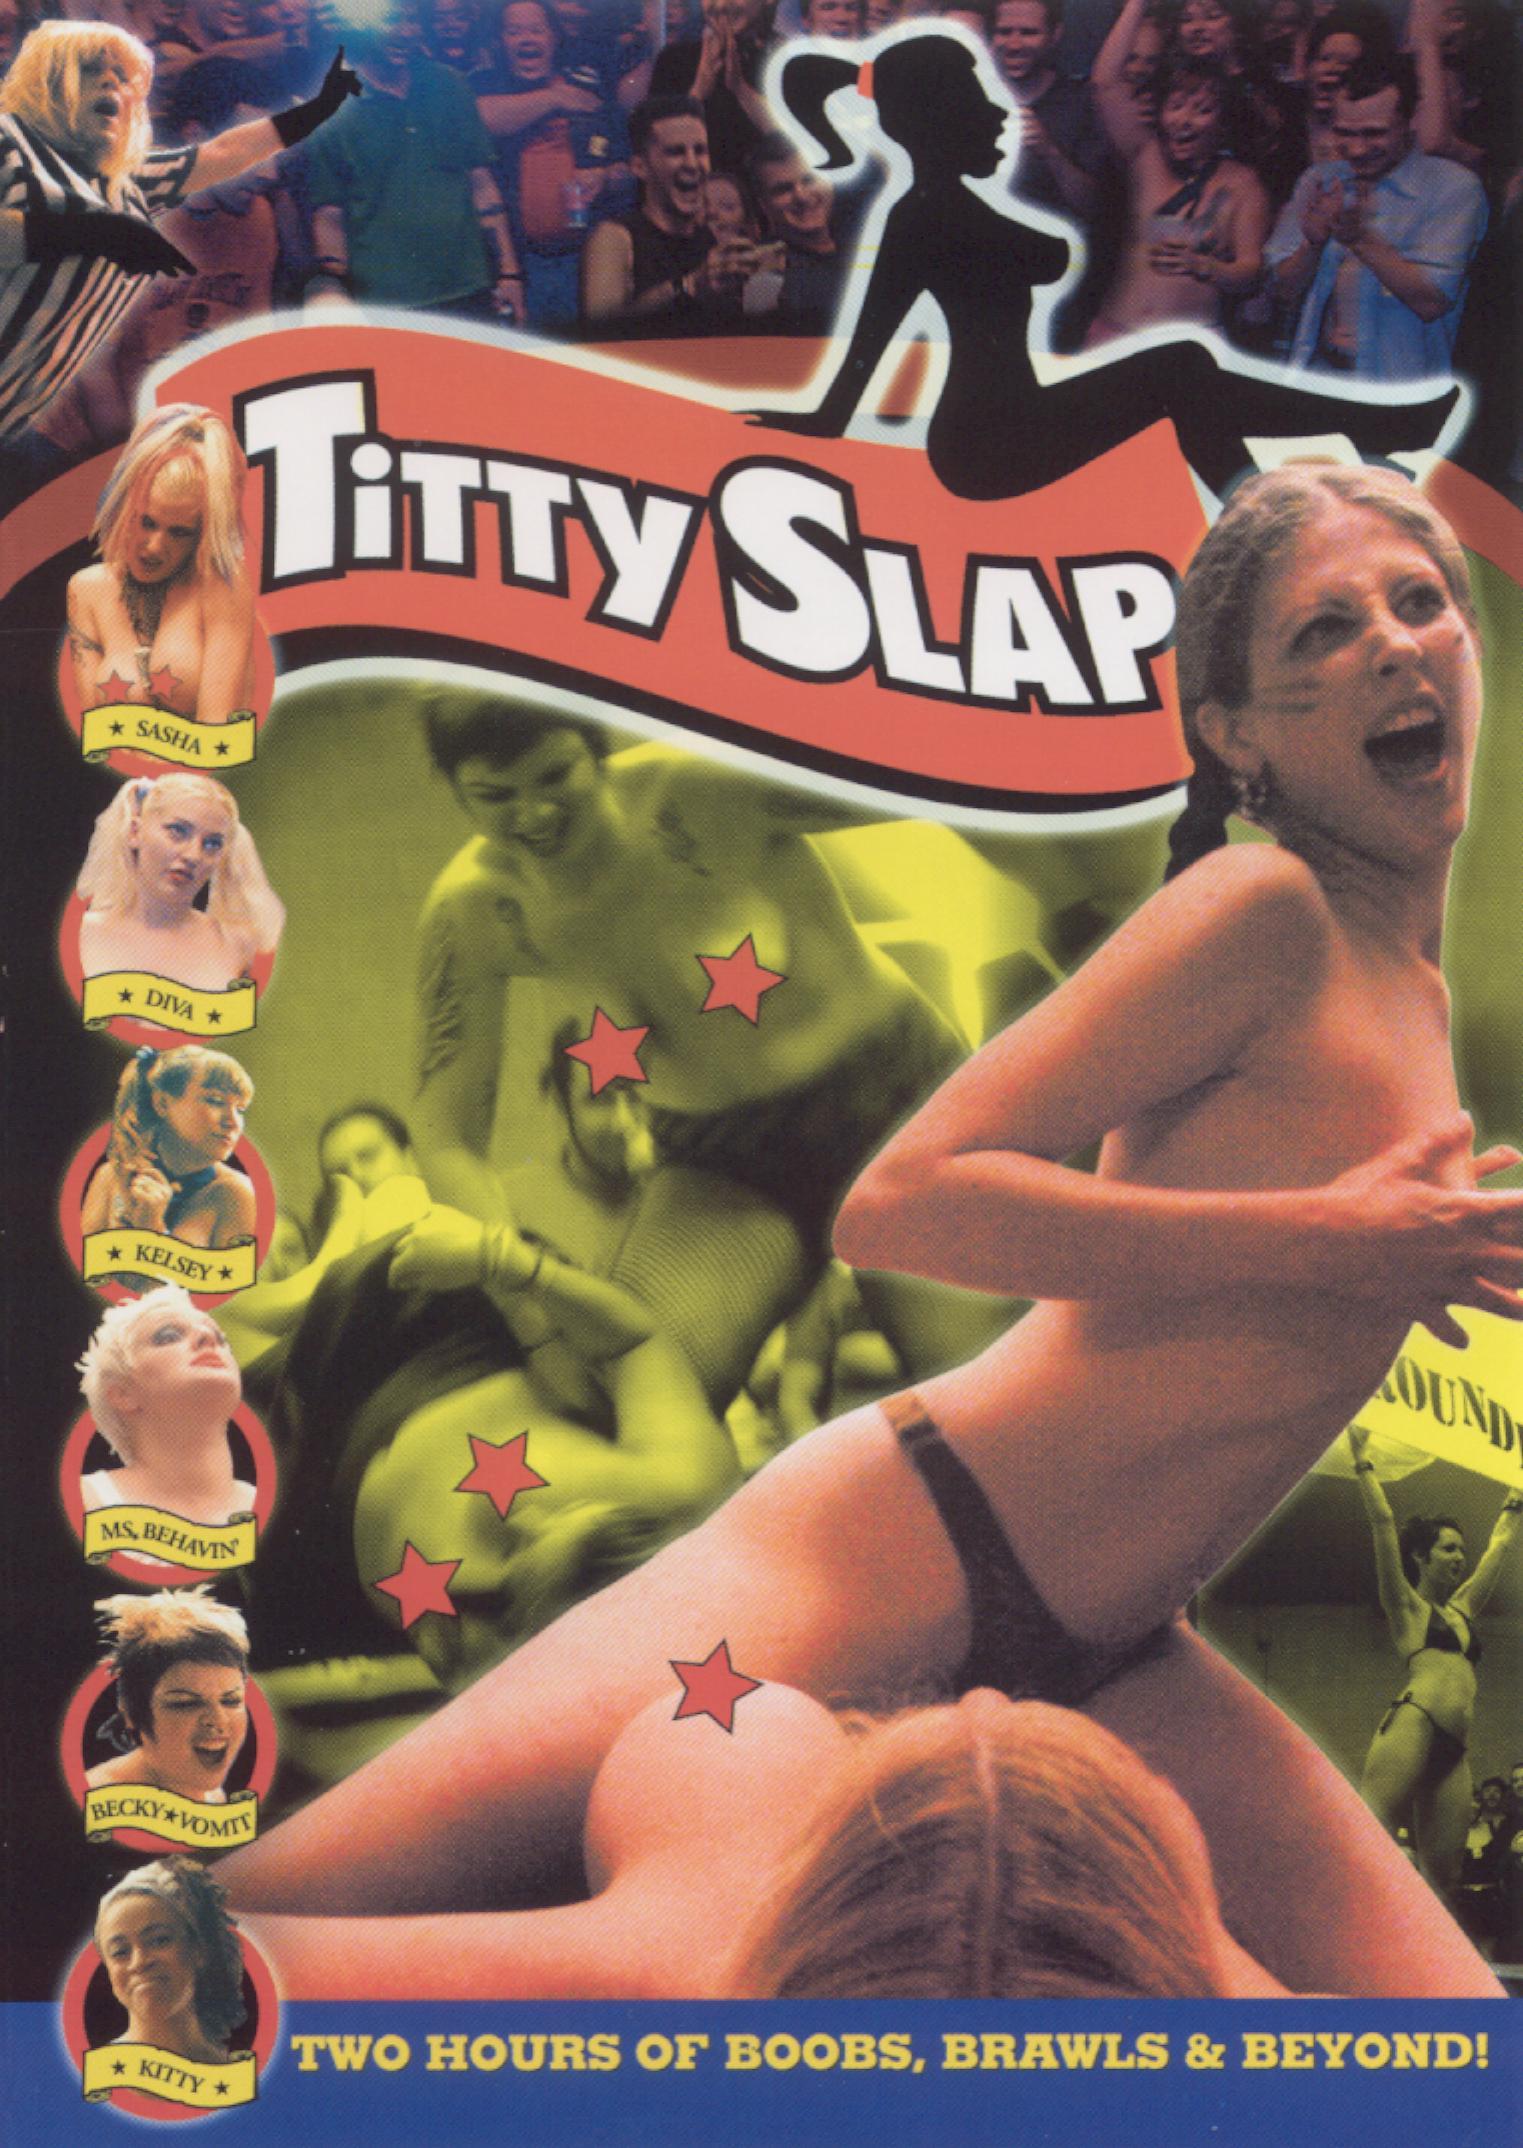 Titty Slap: The Ultimate Bitch Fight